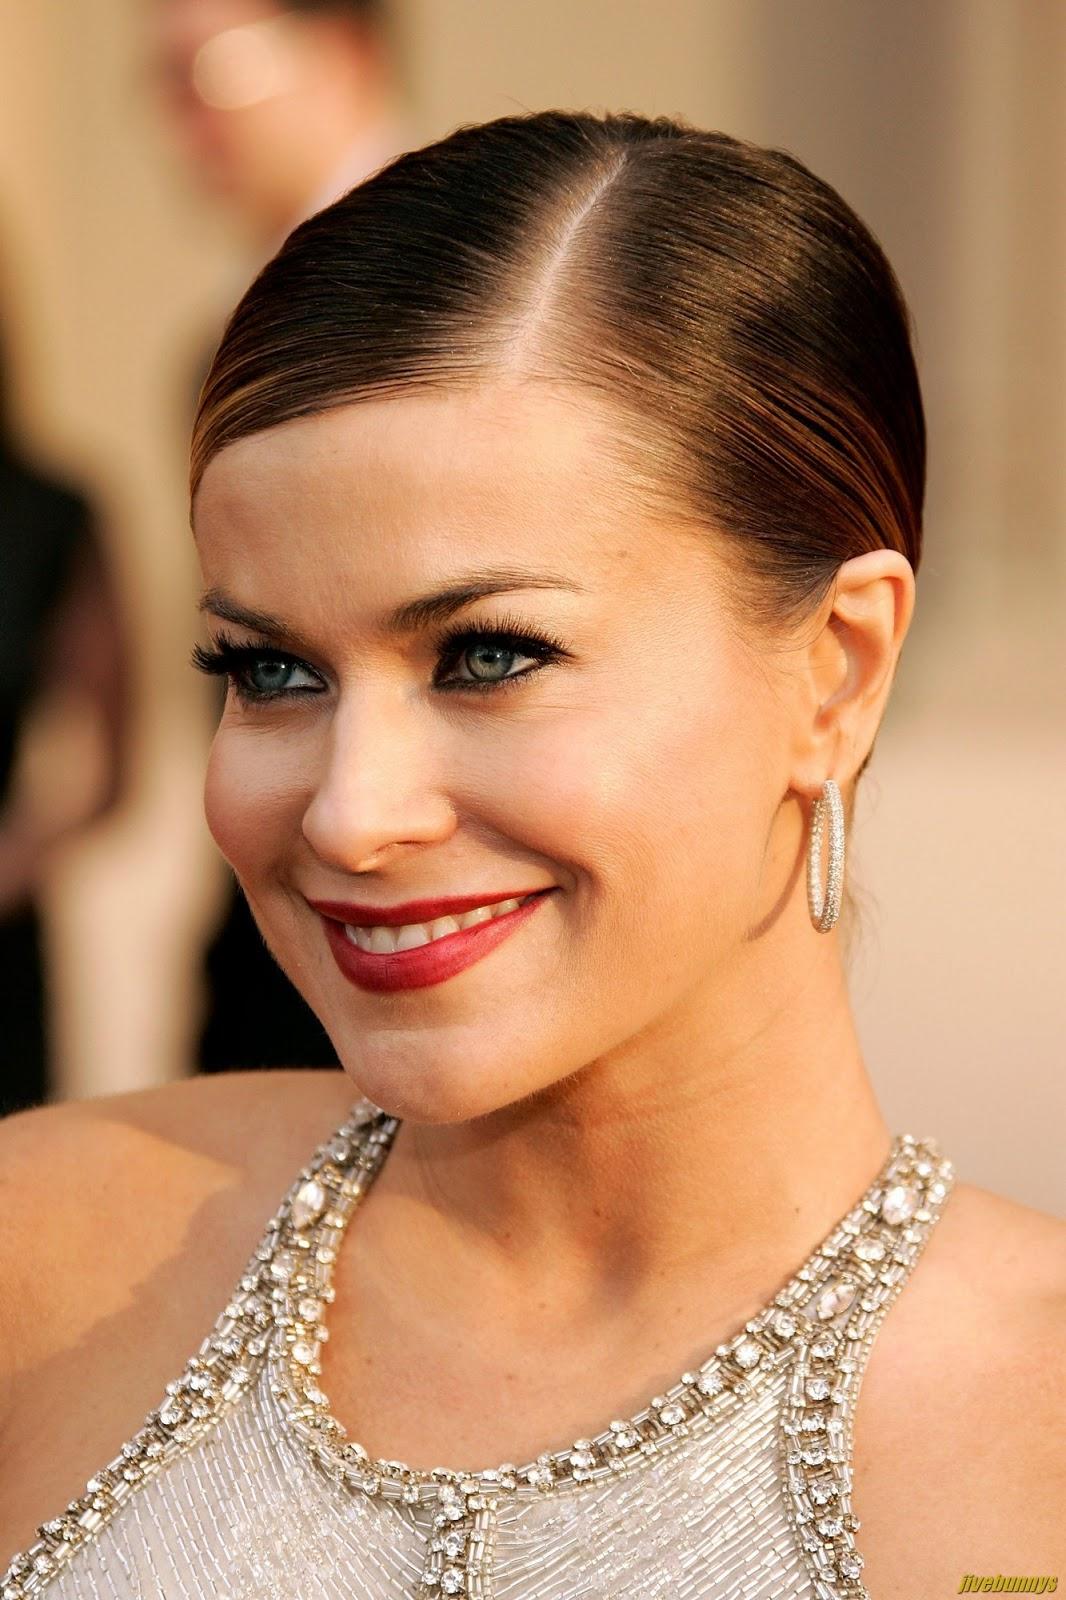 Jivebunnys Female Celebrity Picture Gallery: Carmen ...